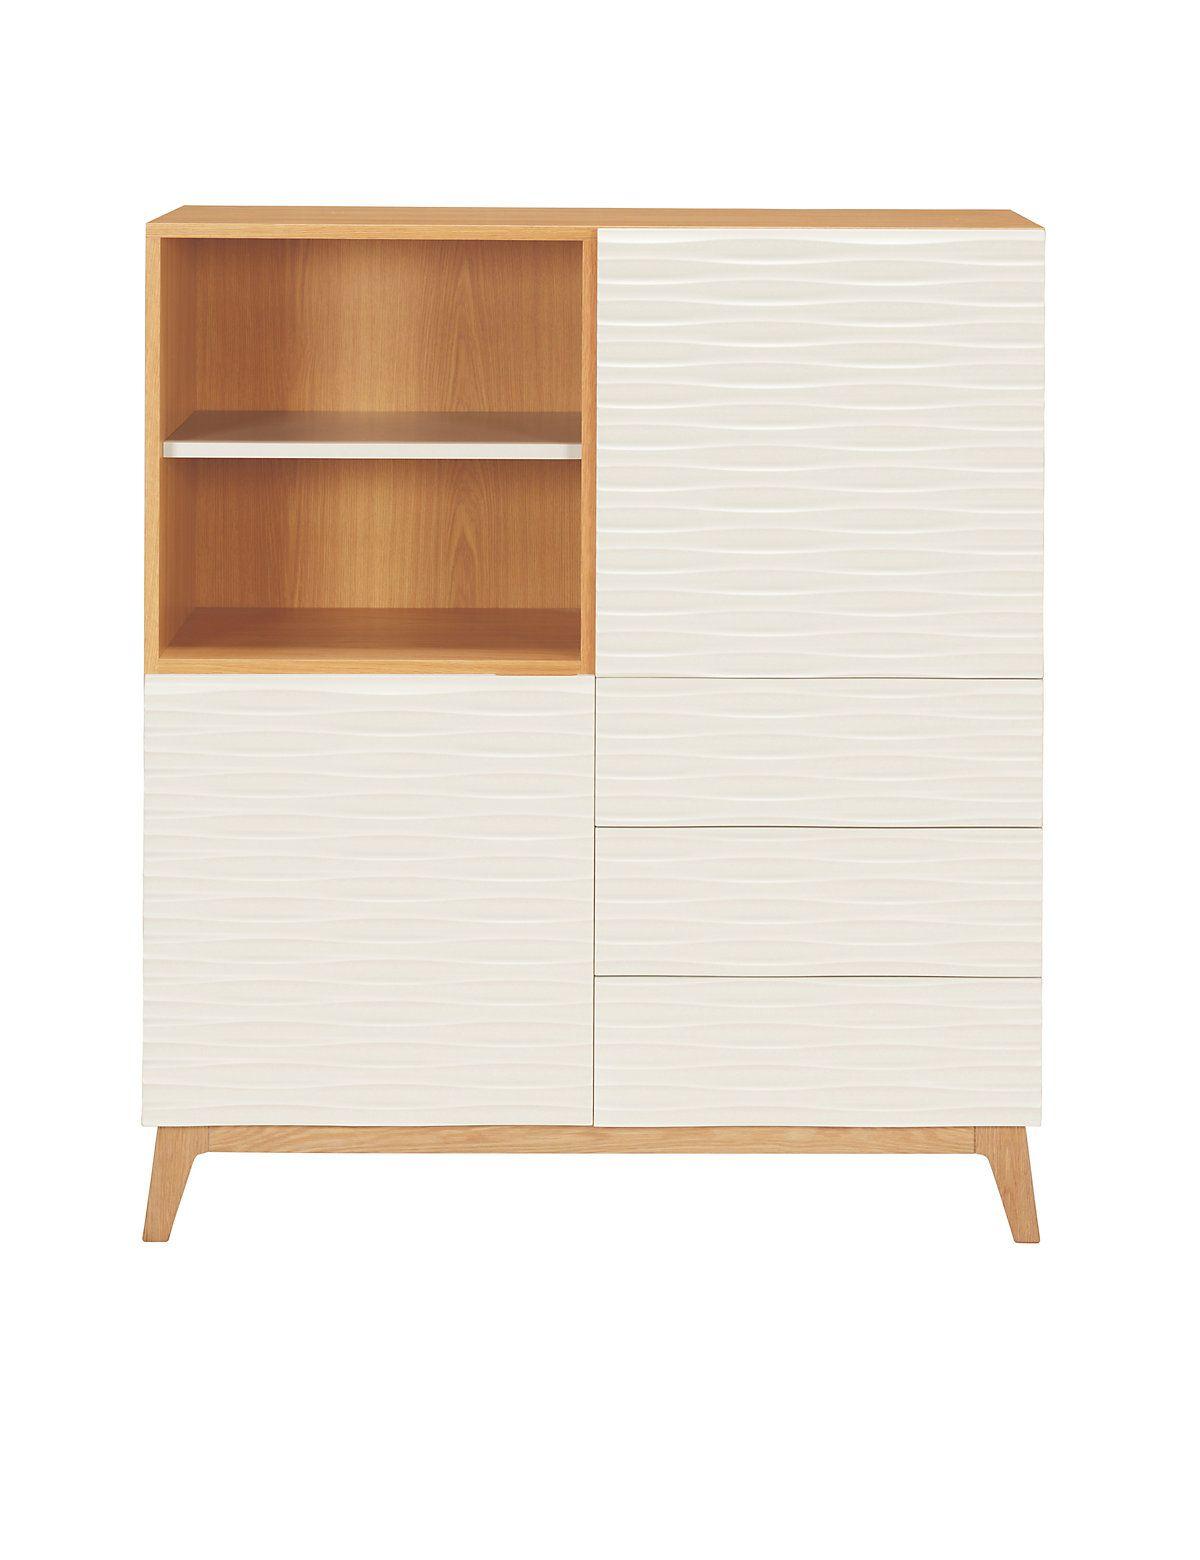 £699 - not sure if oak veneer would look cheap? Milton Storage Cabinet | M&S